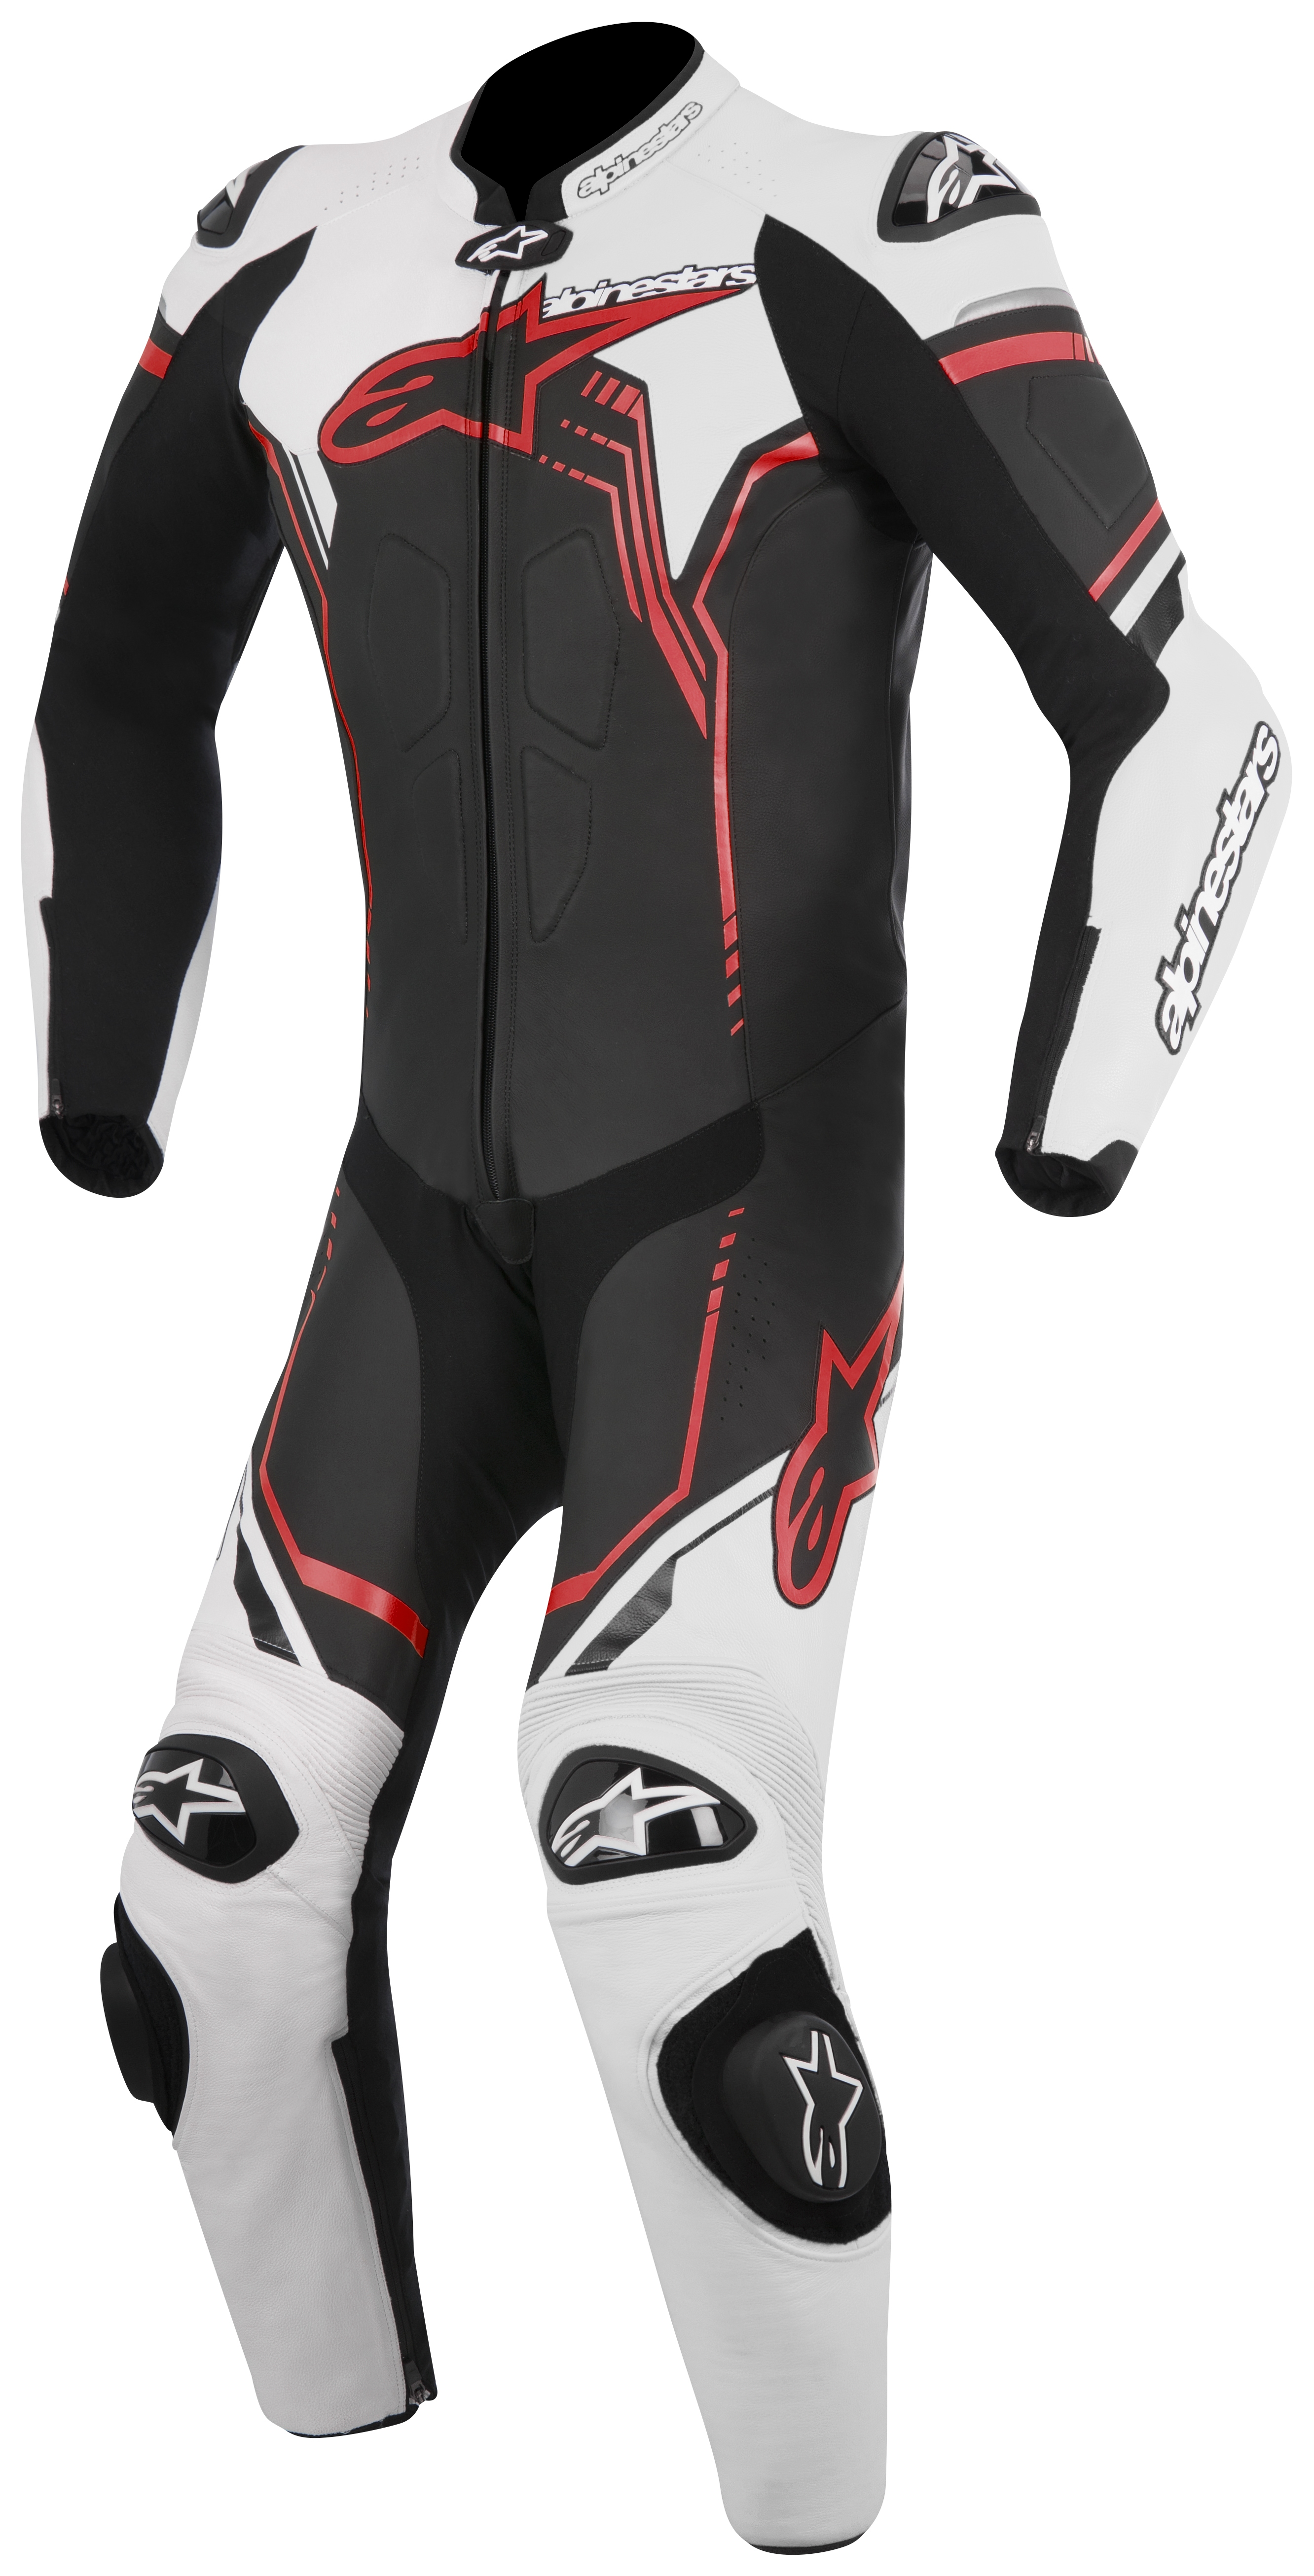 alpinestars gp plus race suit revzilla. Black Bedroom Furniture Sets. Home Design Ideas